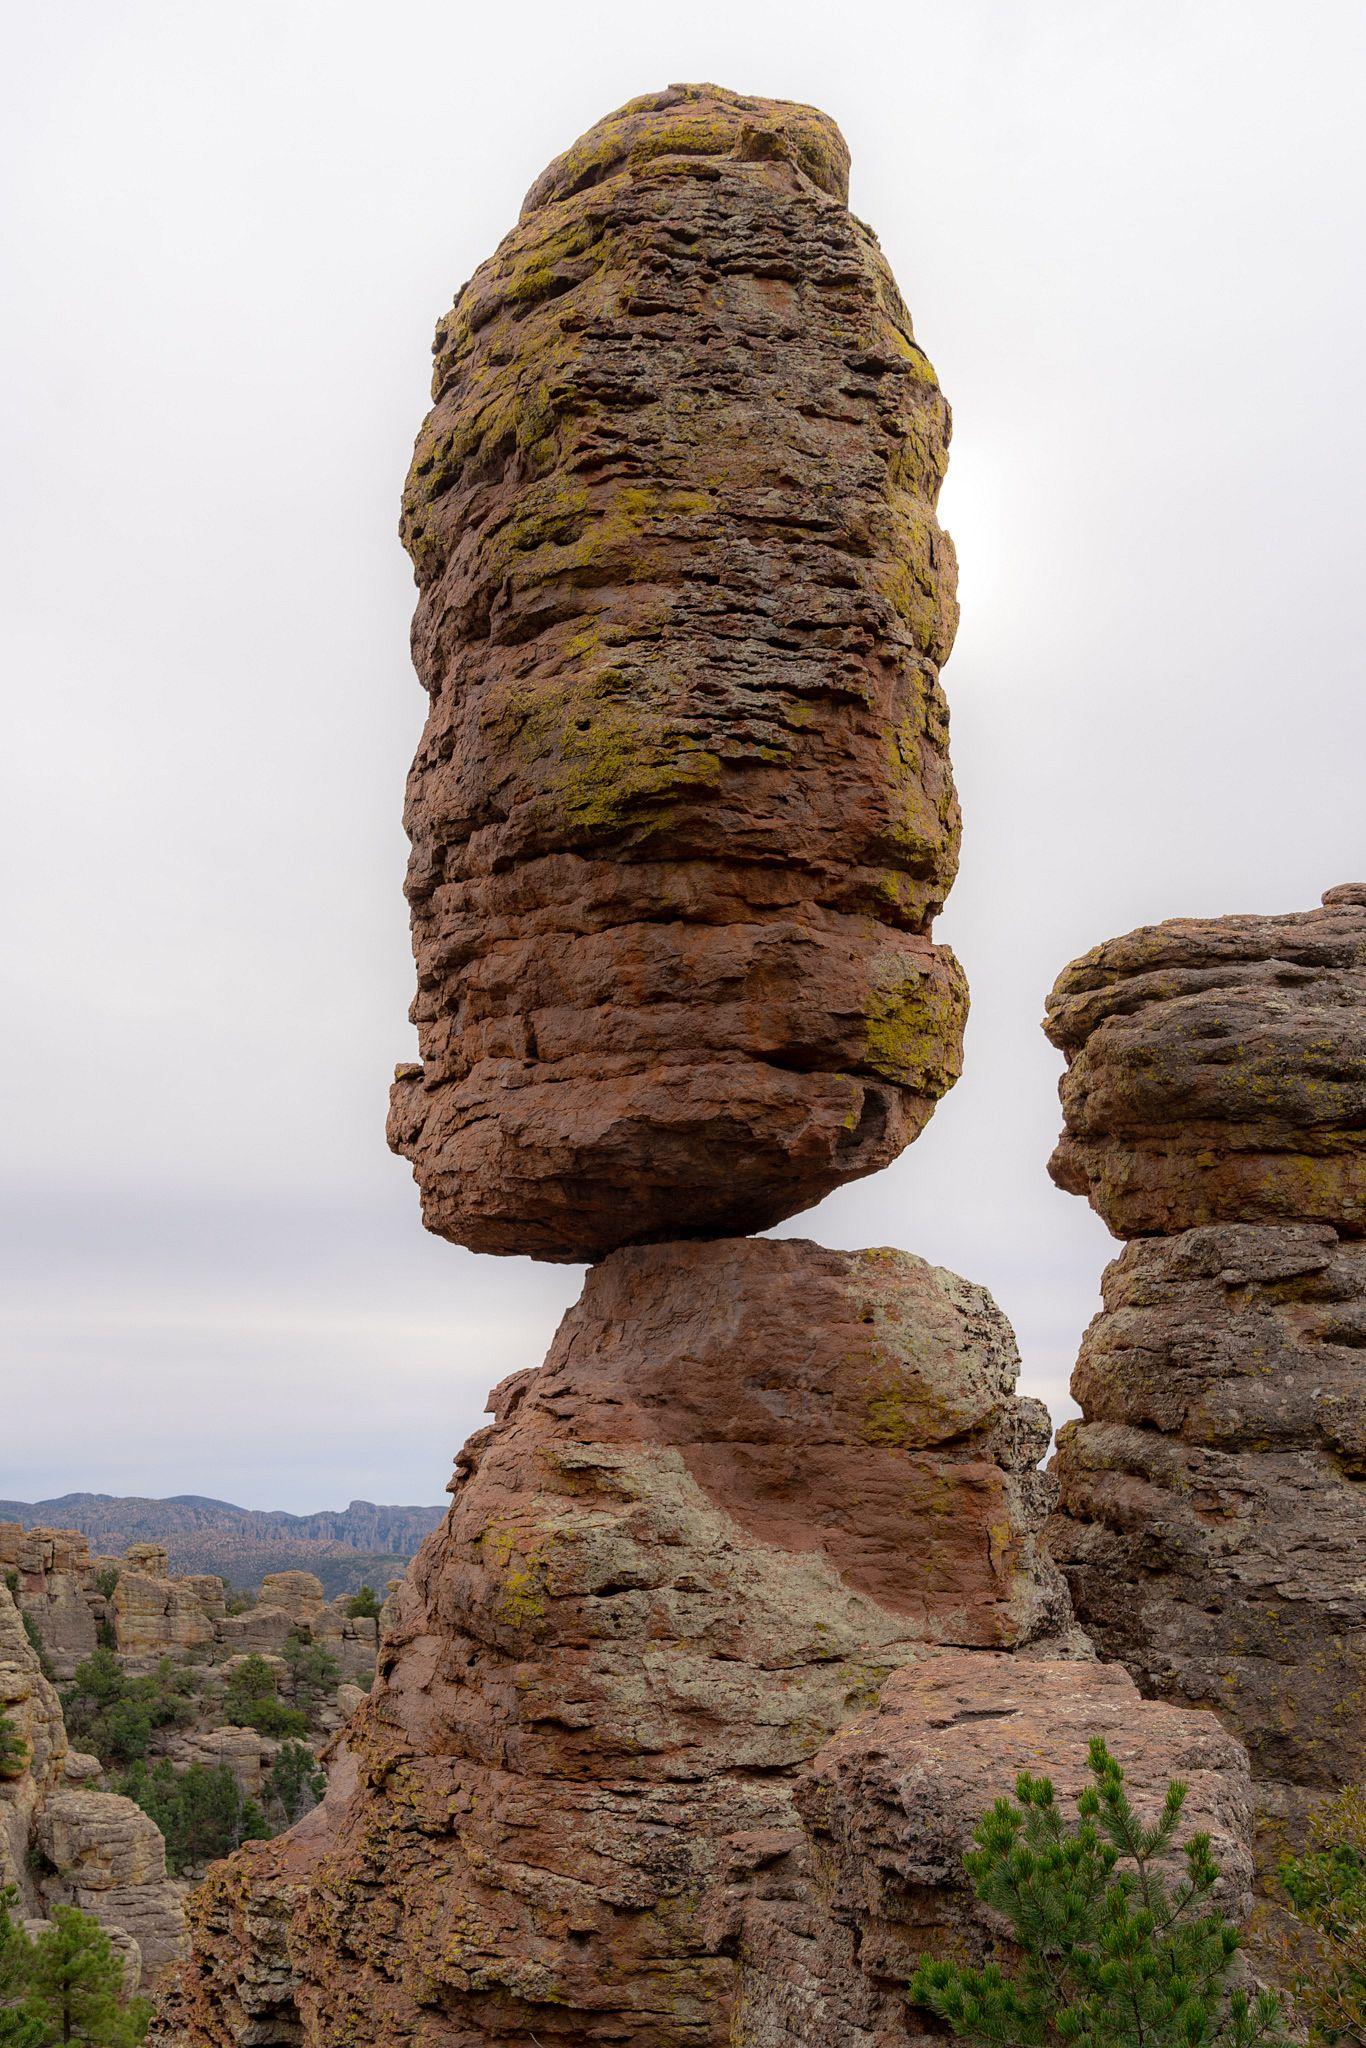 Pinnacle Balanced Rock, Chiricahua National Monument